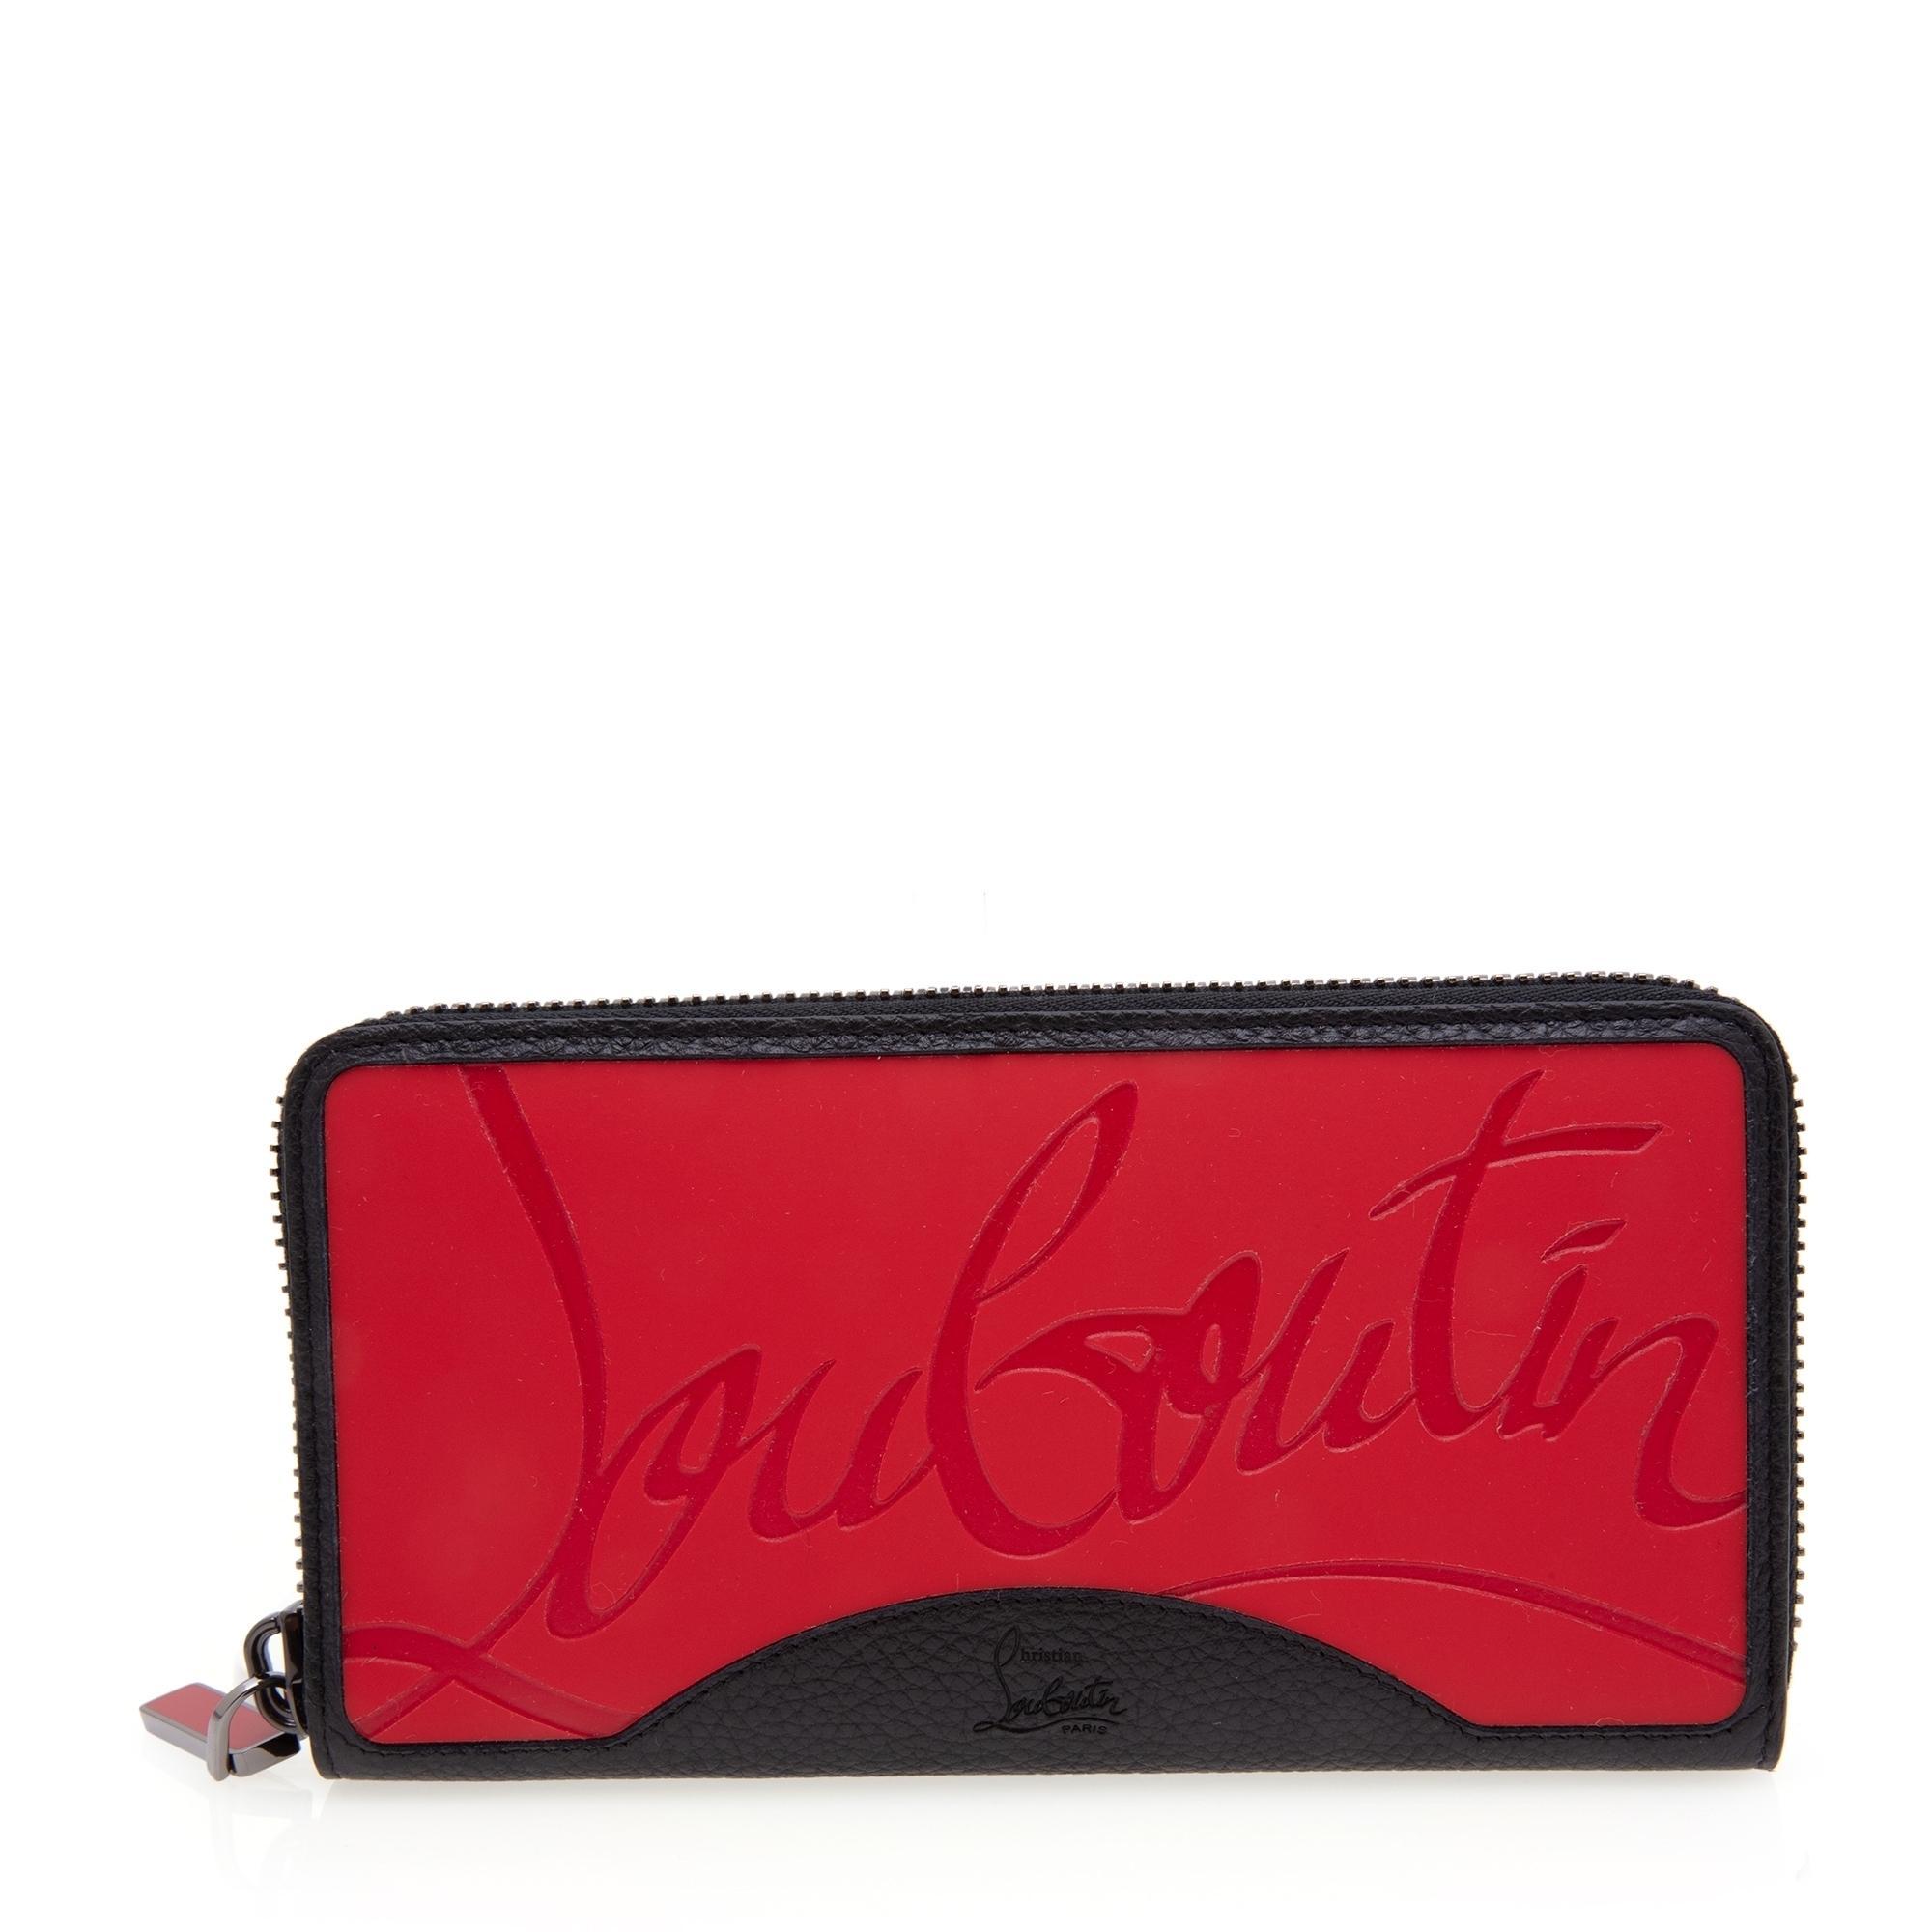 Traveloubi wallet